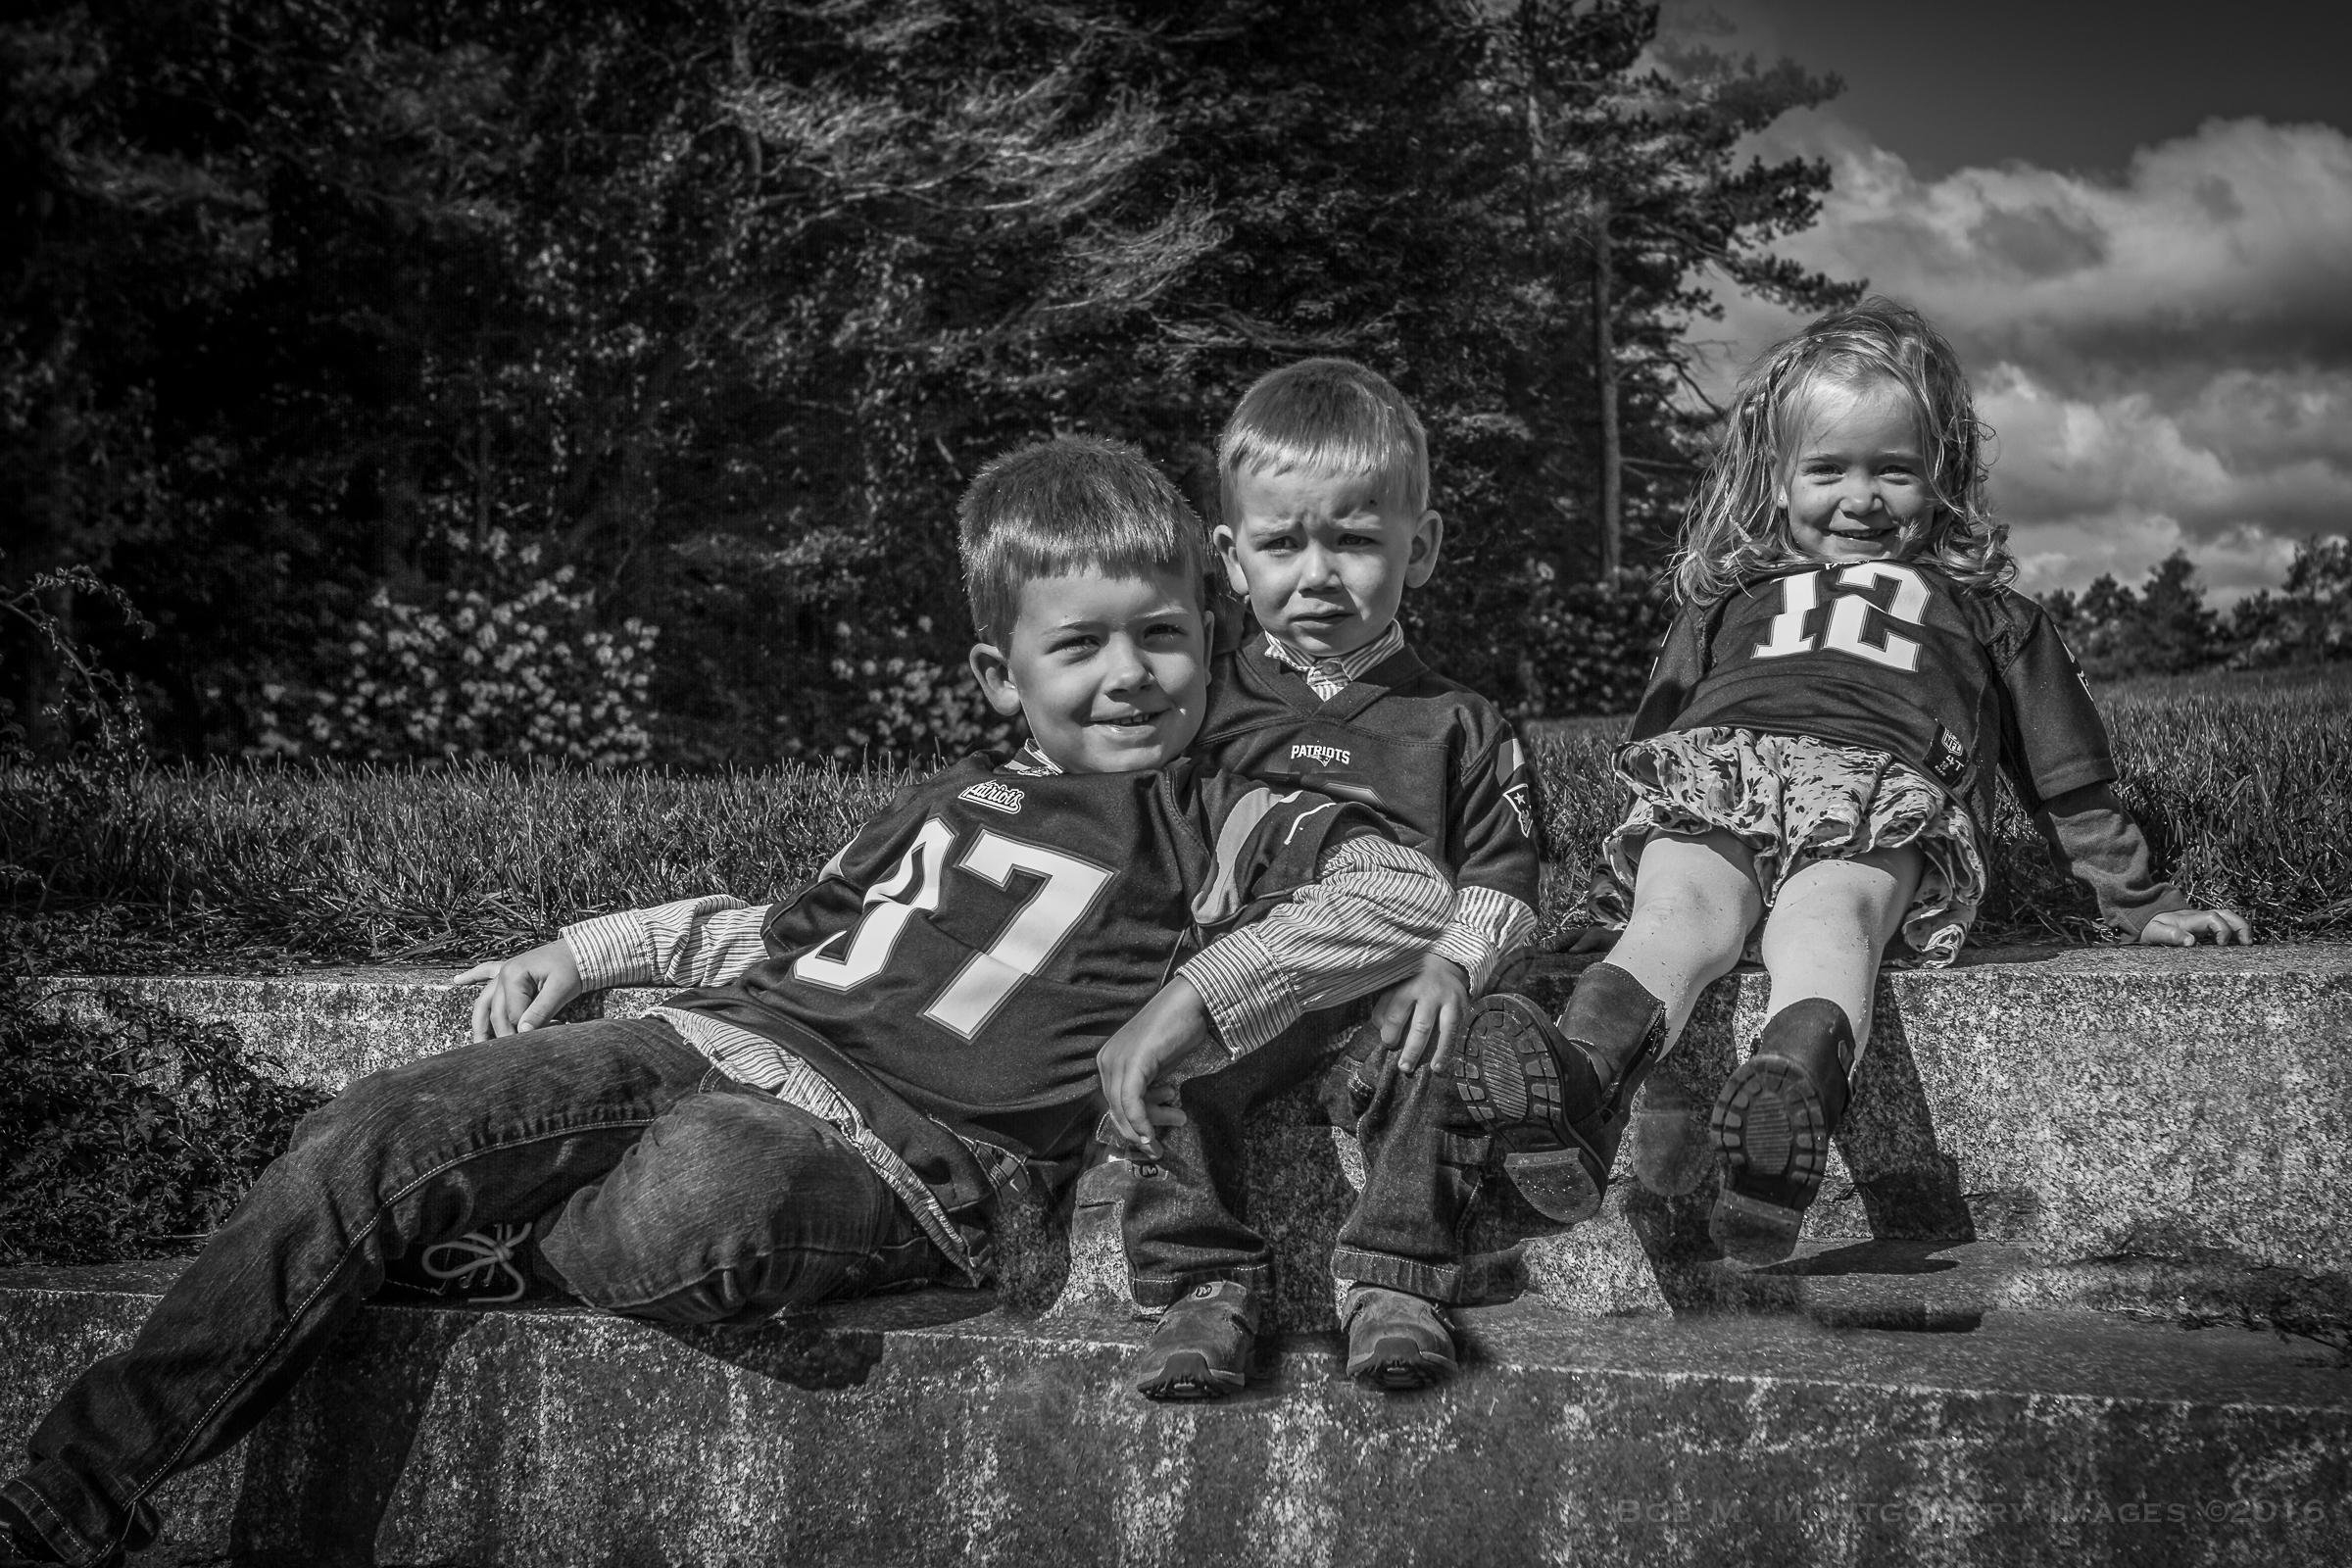 Emery kids group 20160925 - 0011.jpg